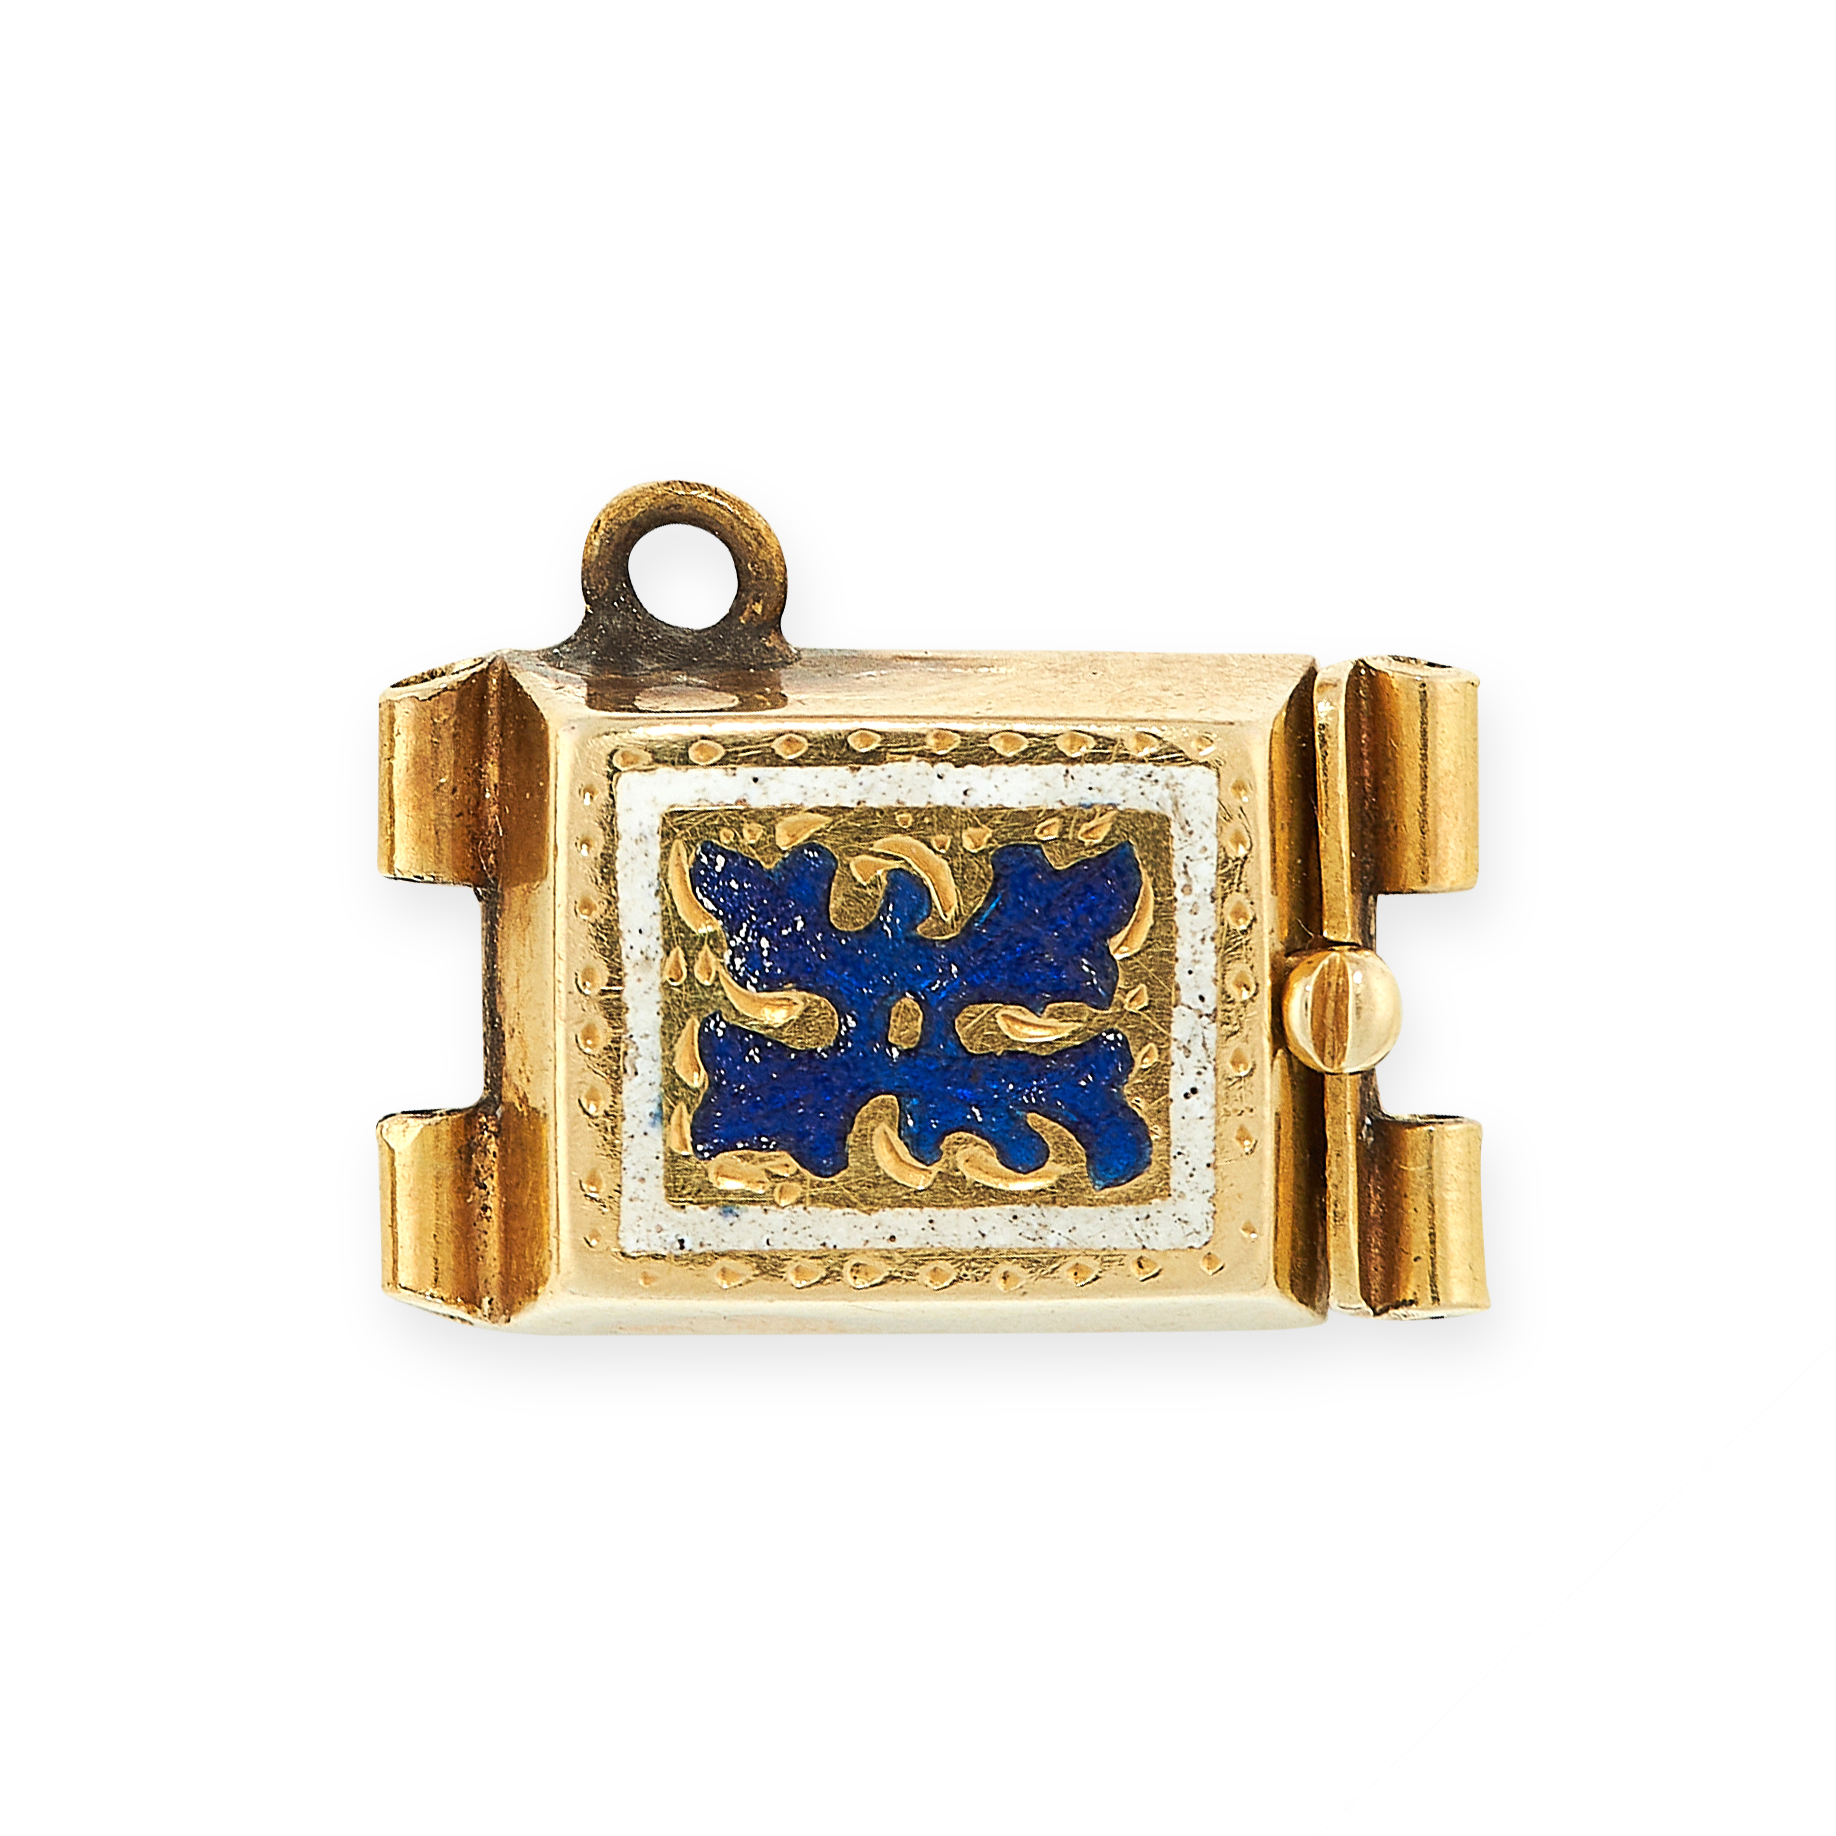 ANTIQUE ENAMEL NECKLACE / BRACELET CLASP the rectangular face is set with blue enamel in foliate